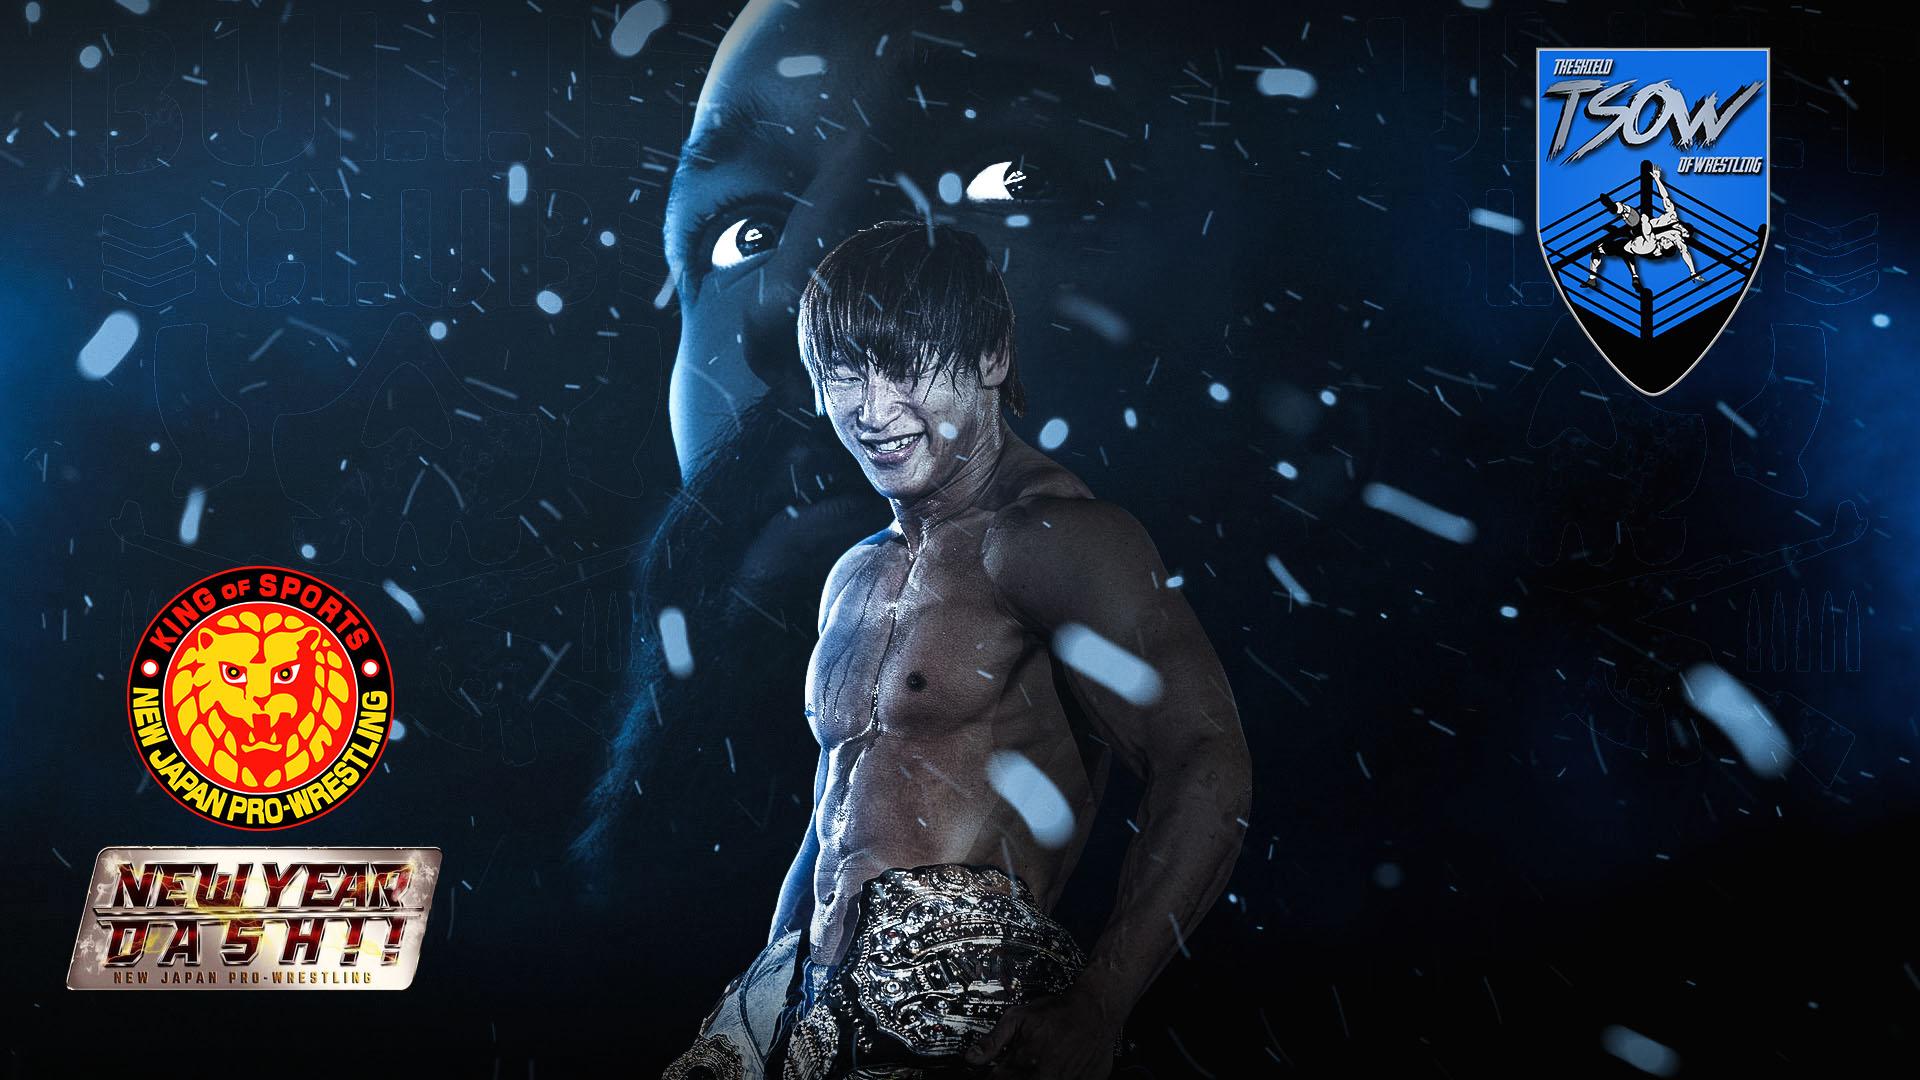 NJPW New Year Dash Risultati Live